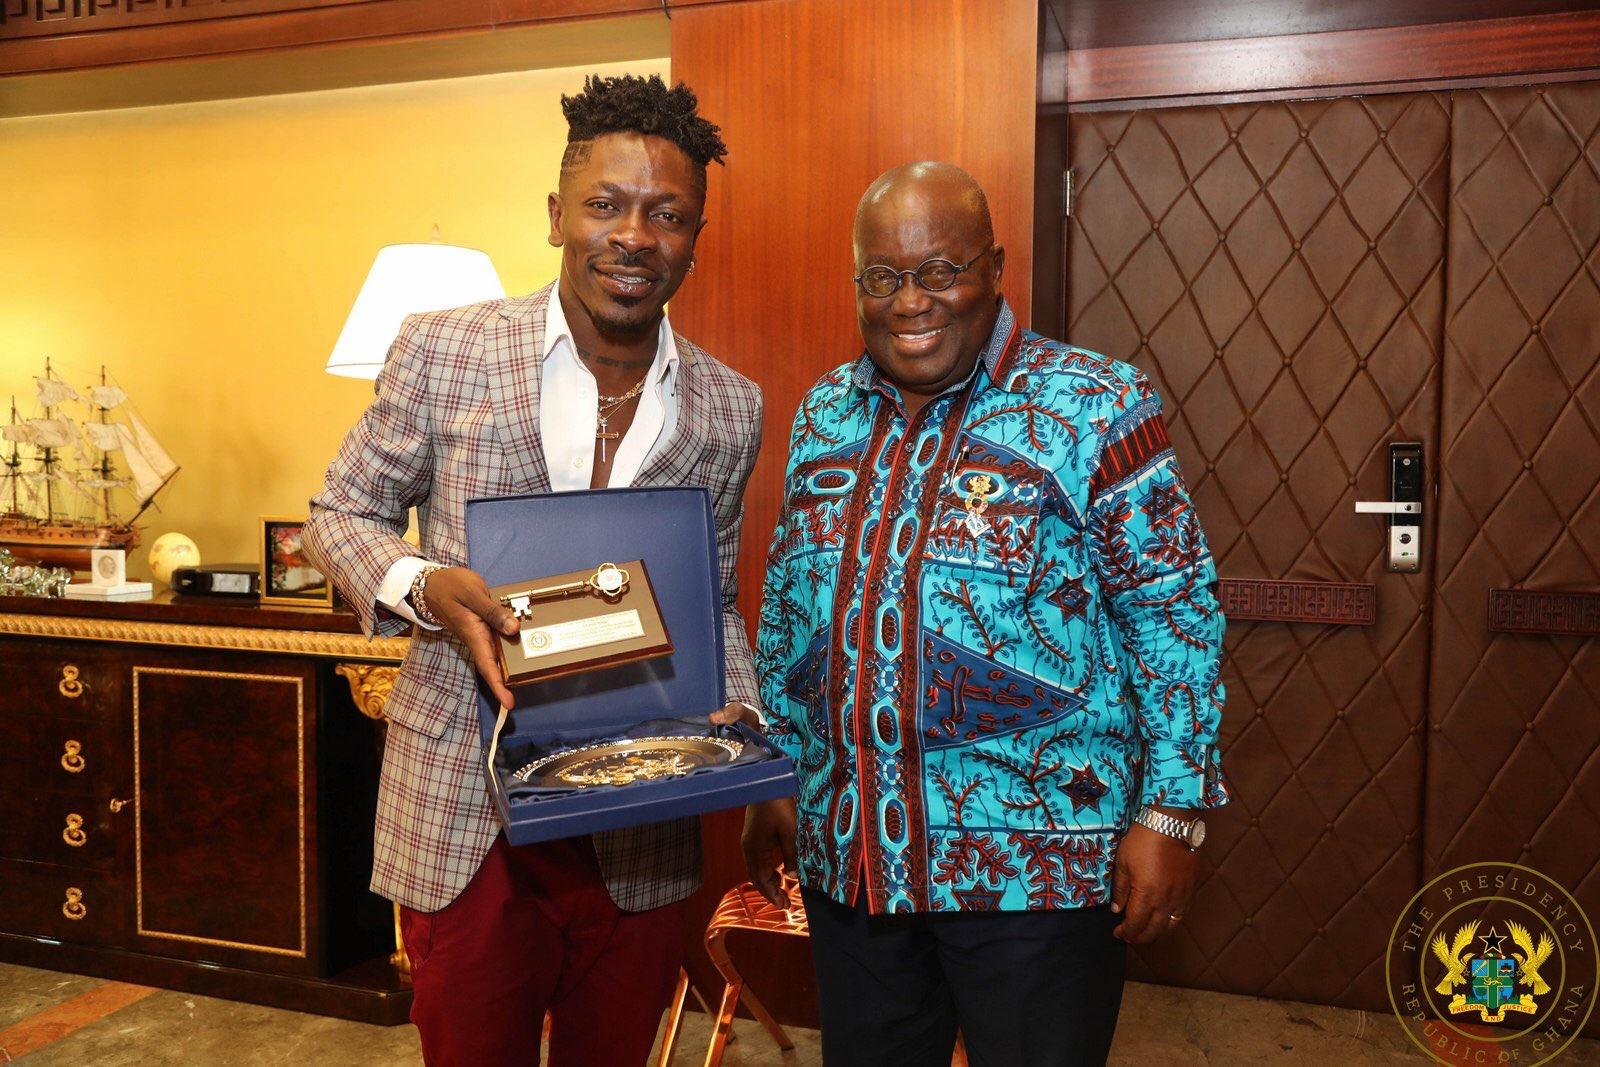 Shatta Wale and Nana Akufo-Addo